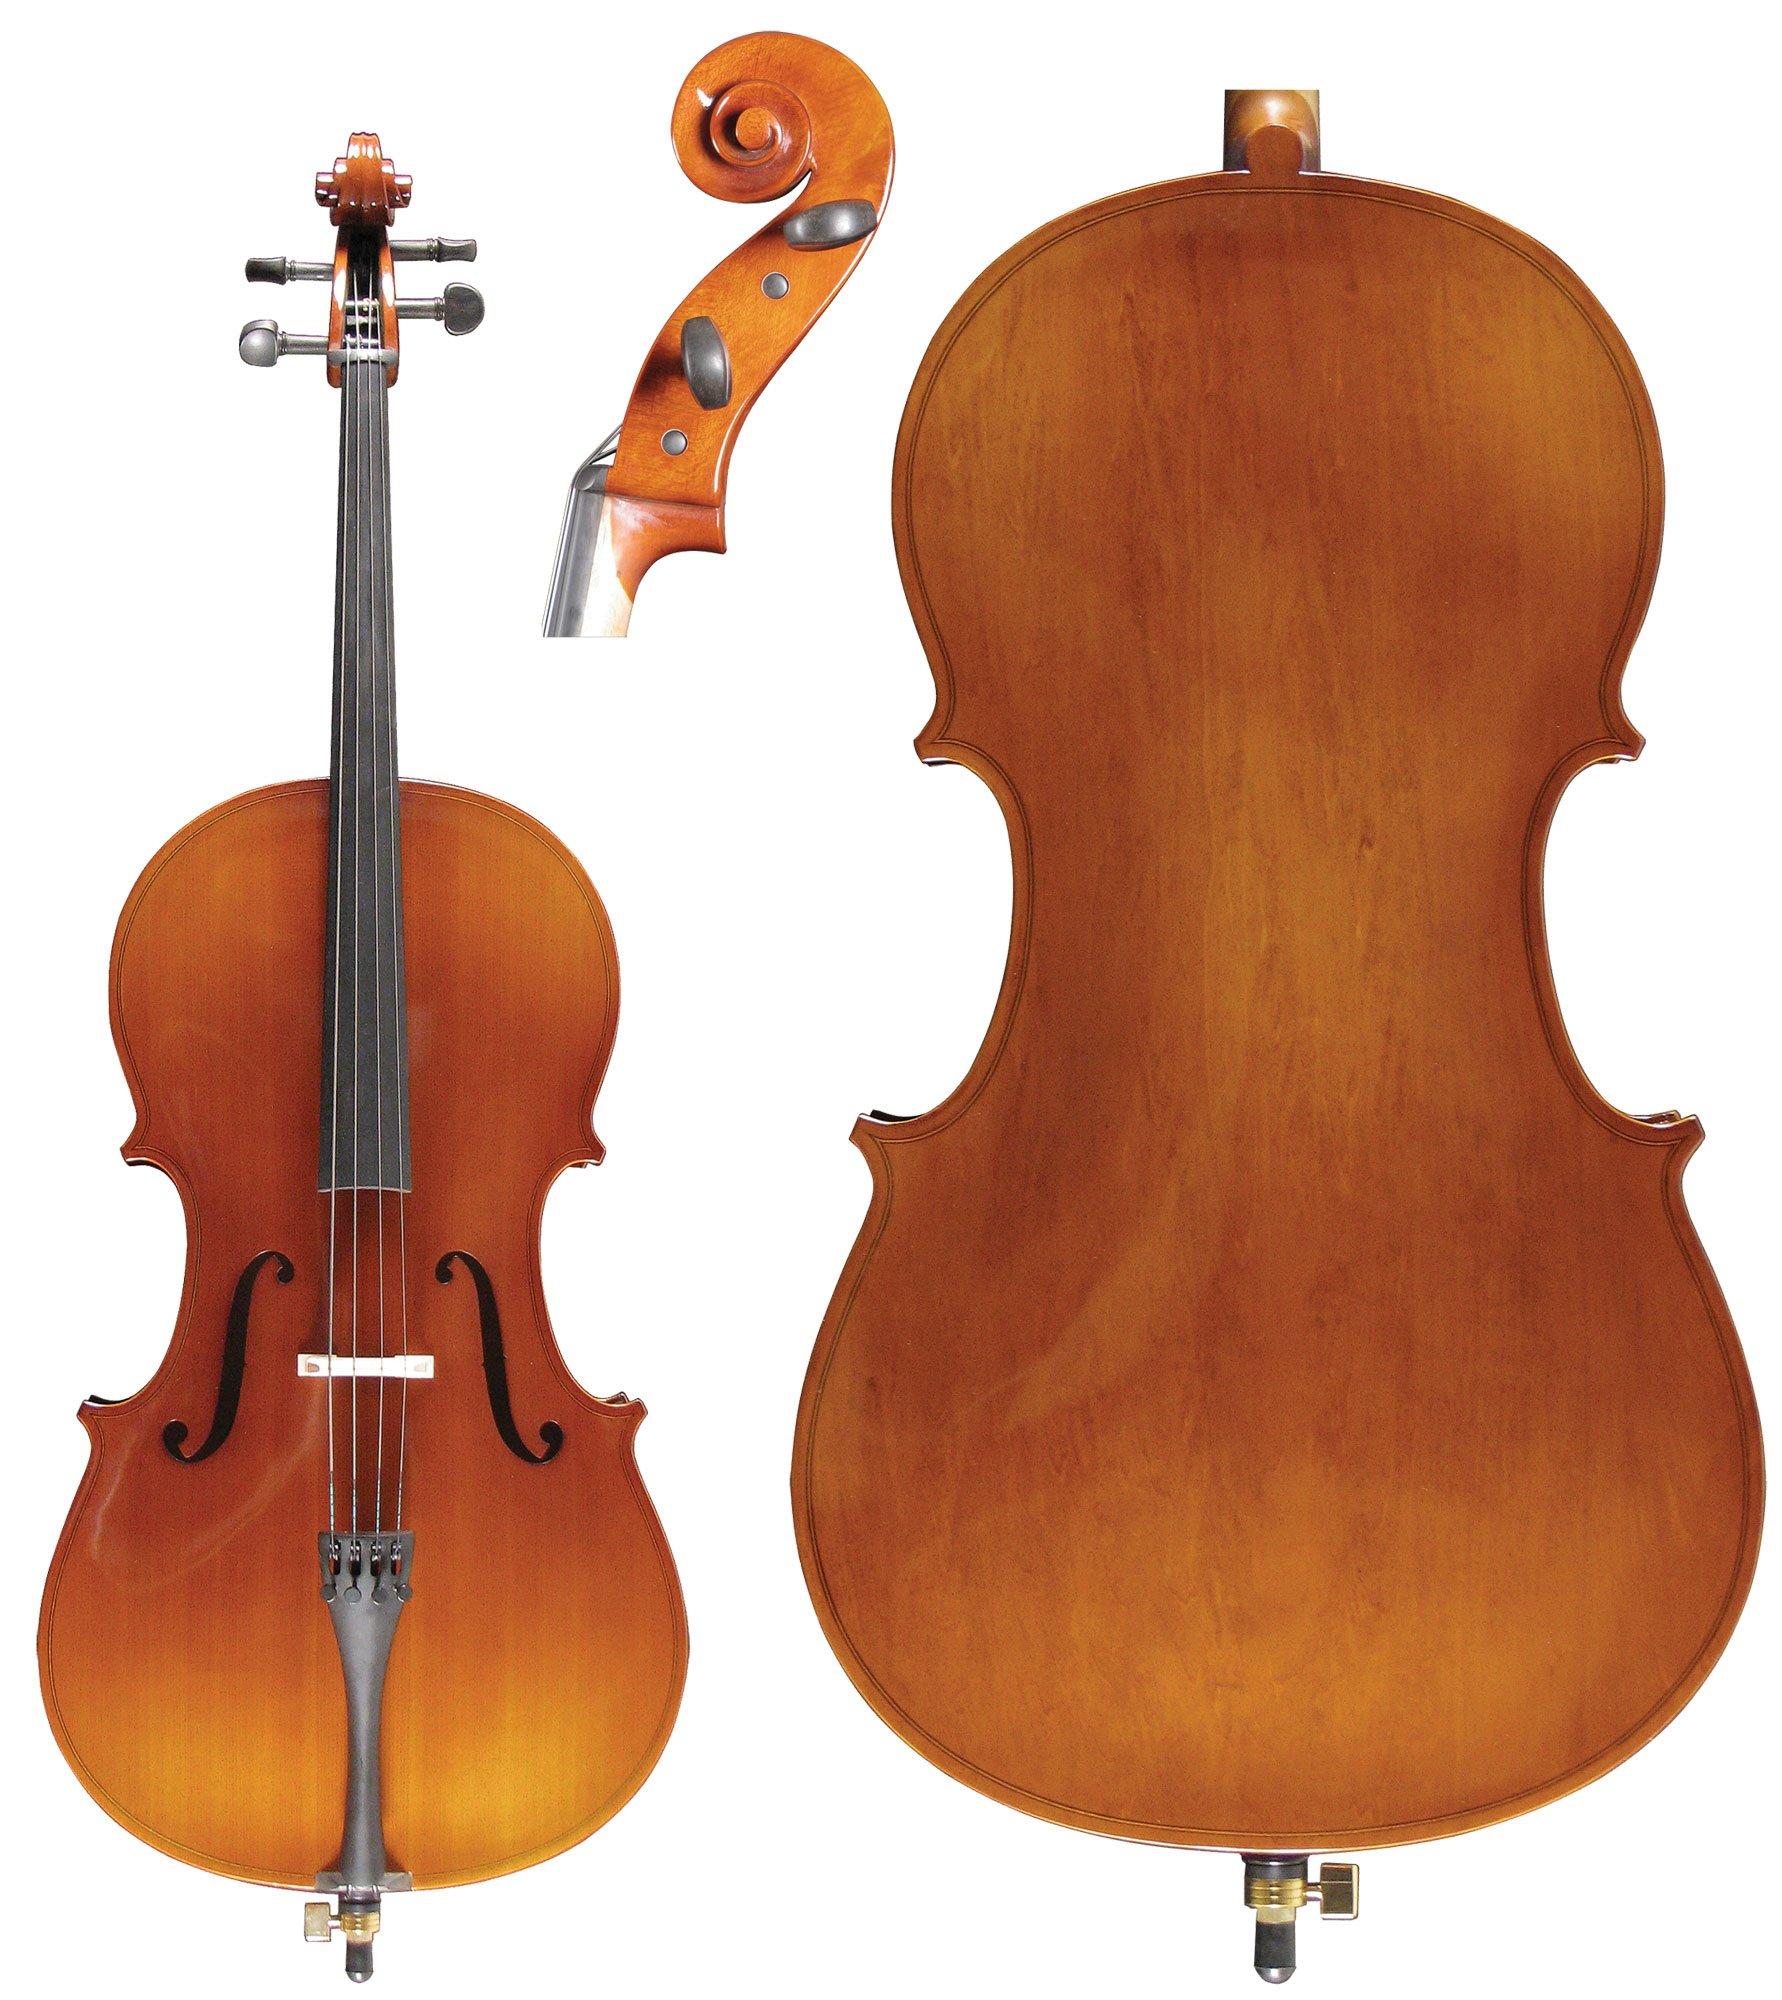 M. Ravel, 4-String Cello - Acoustic (CE1001/2)